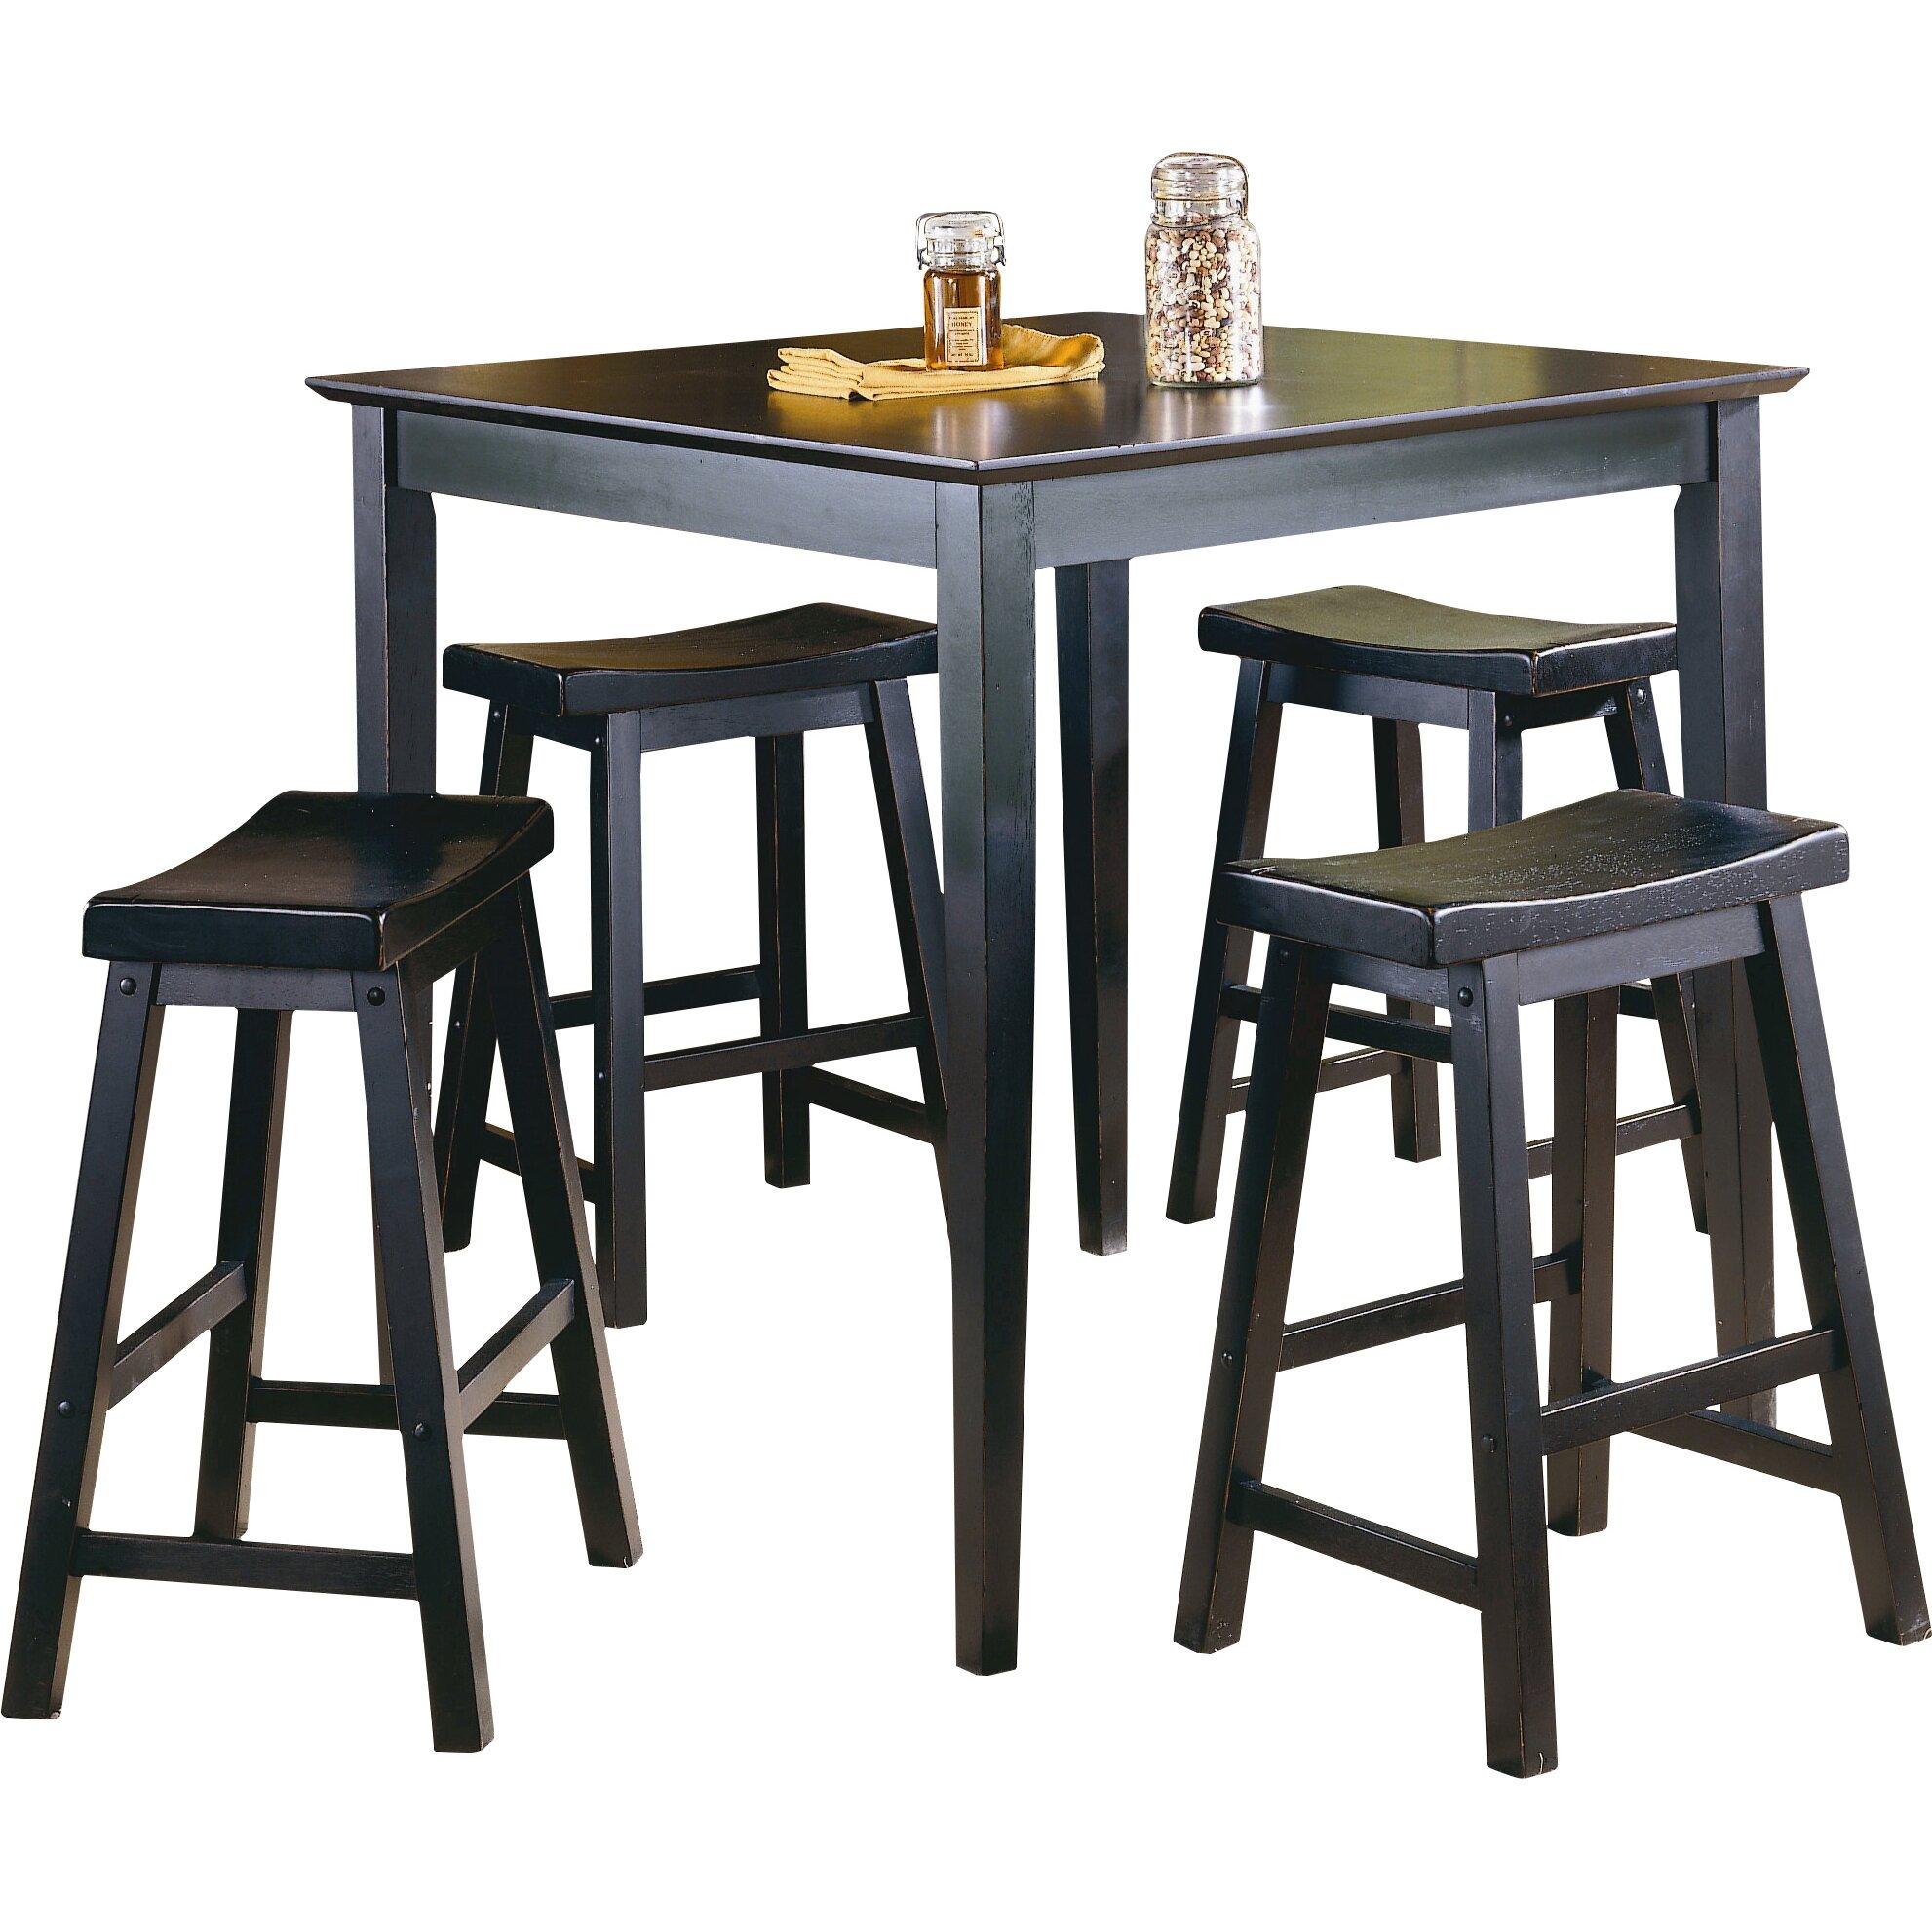 woodhaven hill 5 piece counter height pub set reviews wayfai